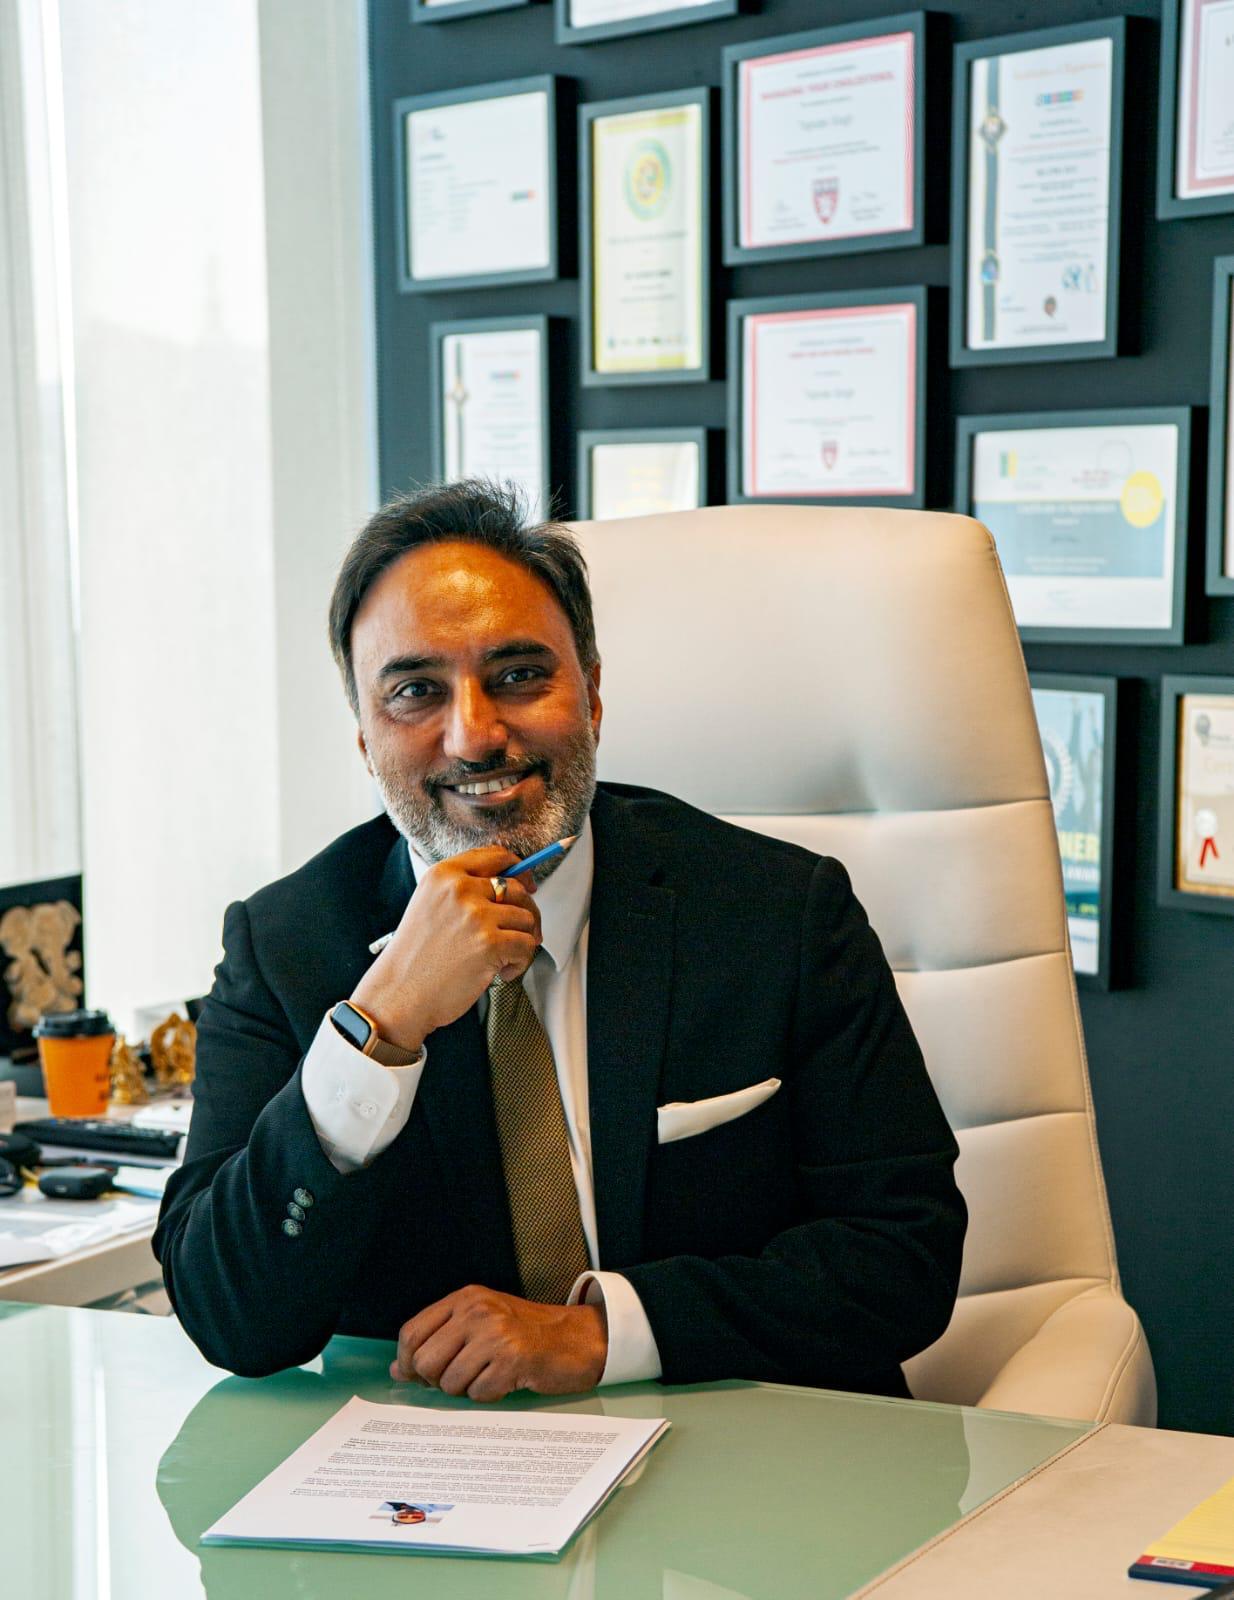 Digital Transformation Ideas Abound In Qatar's Startup Industry, Says Indian Entrepreneur